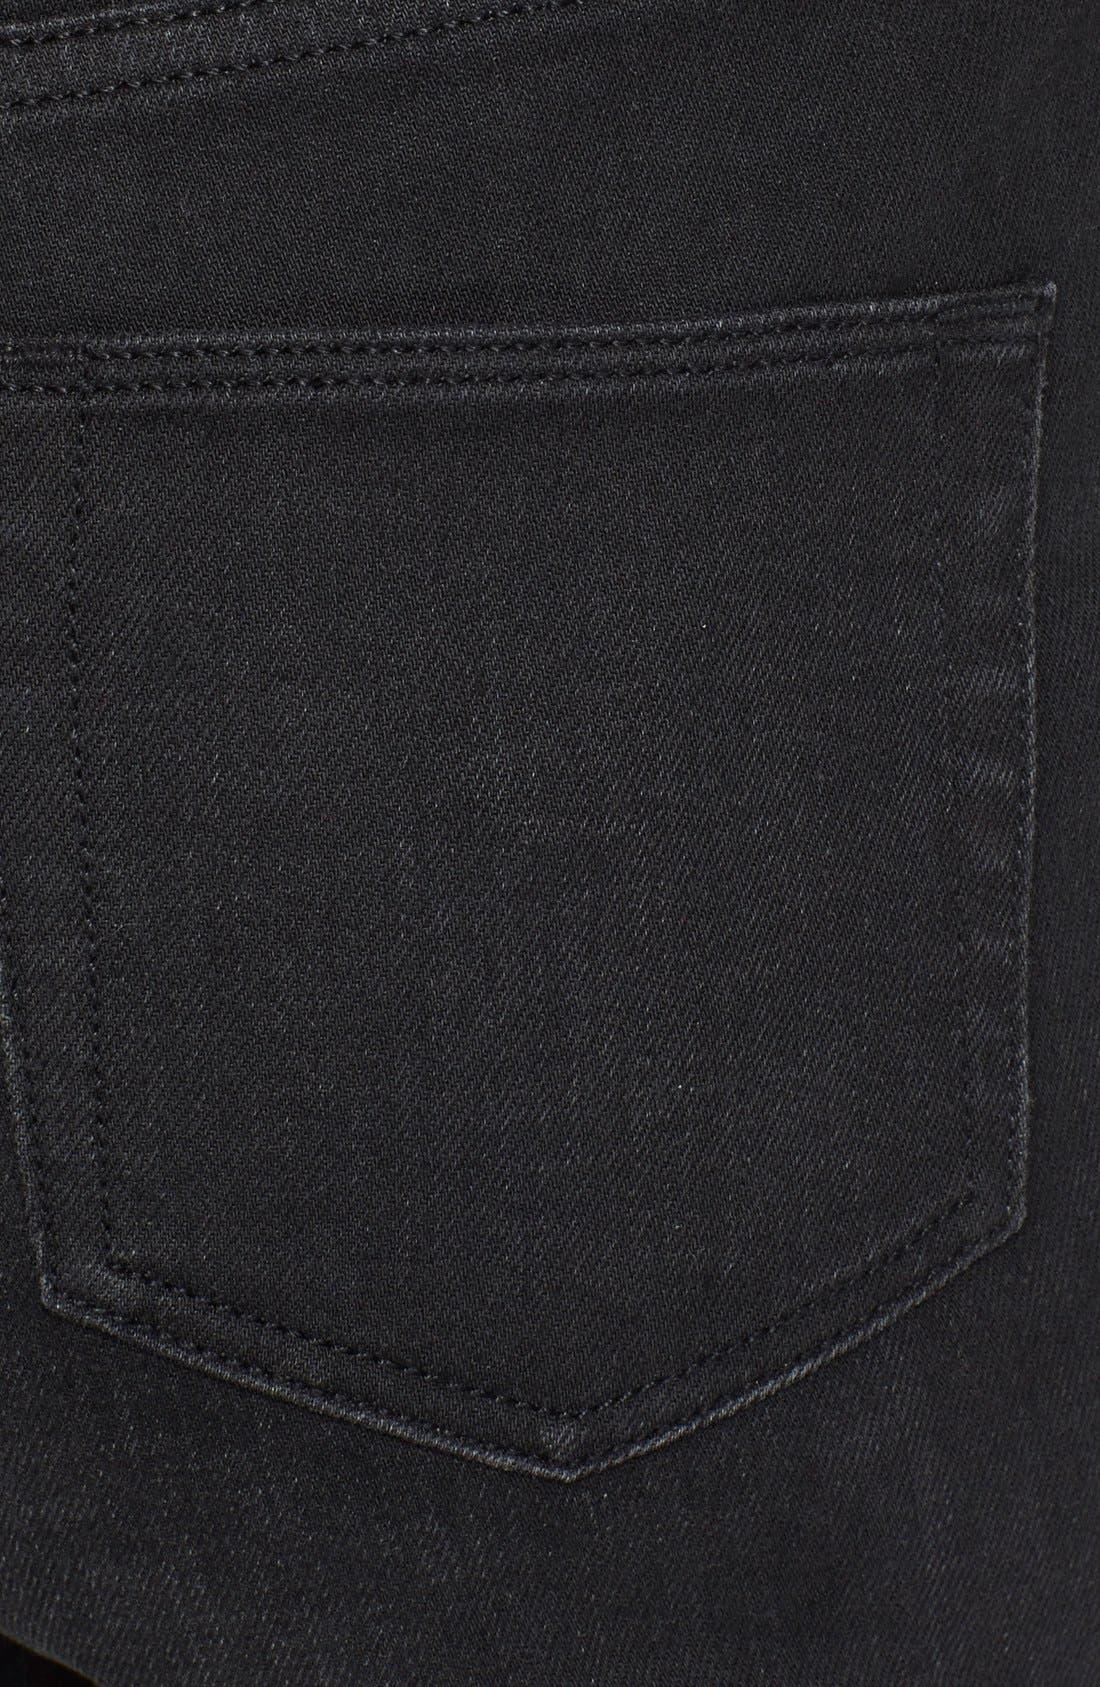 BURBERRY BRIT, Skinny Jeans, Alternate thumbnail 3, color, 001